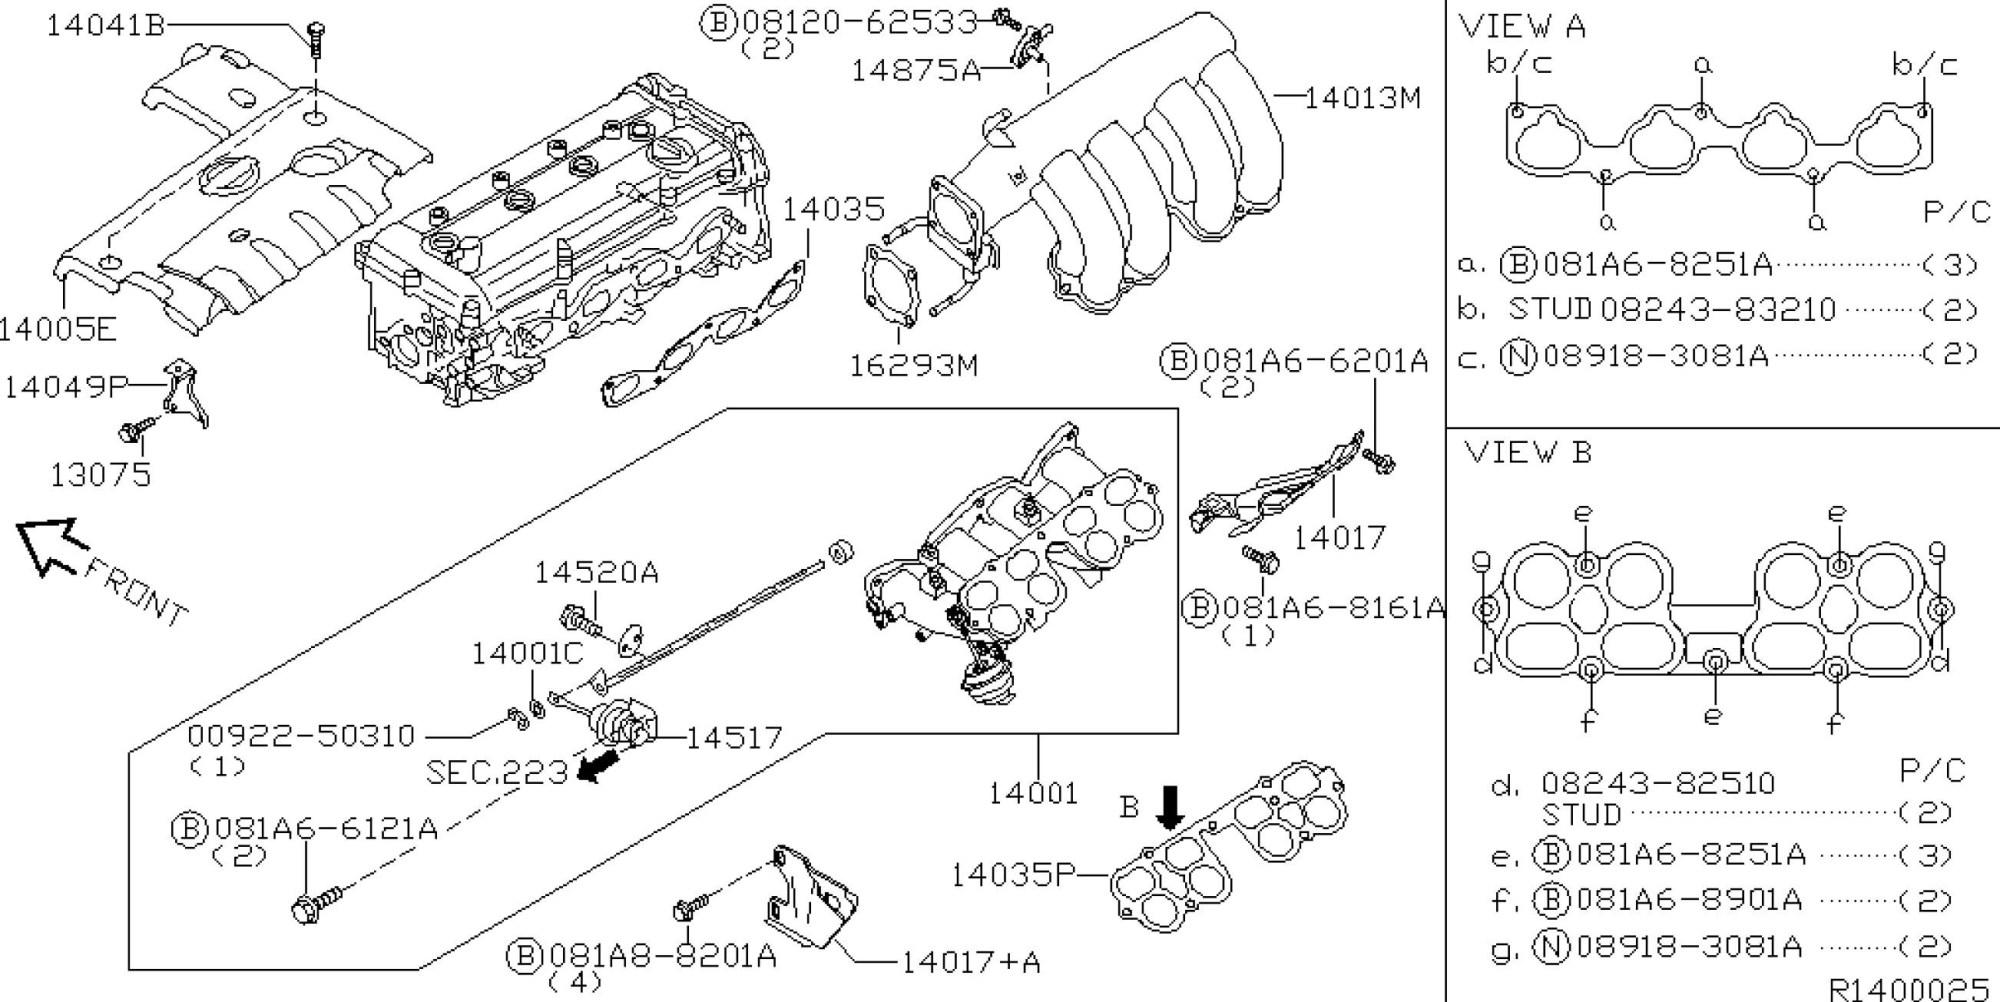 hight resolution of 99 nissan altima engine diagram 1997 nissan sentra 2007 kia spectra fuse box diagram nissan altima